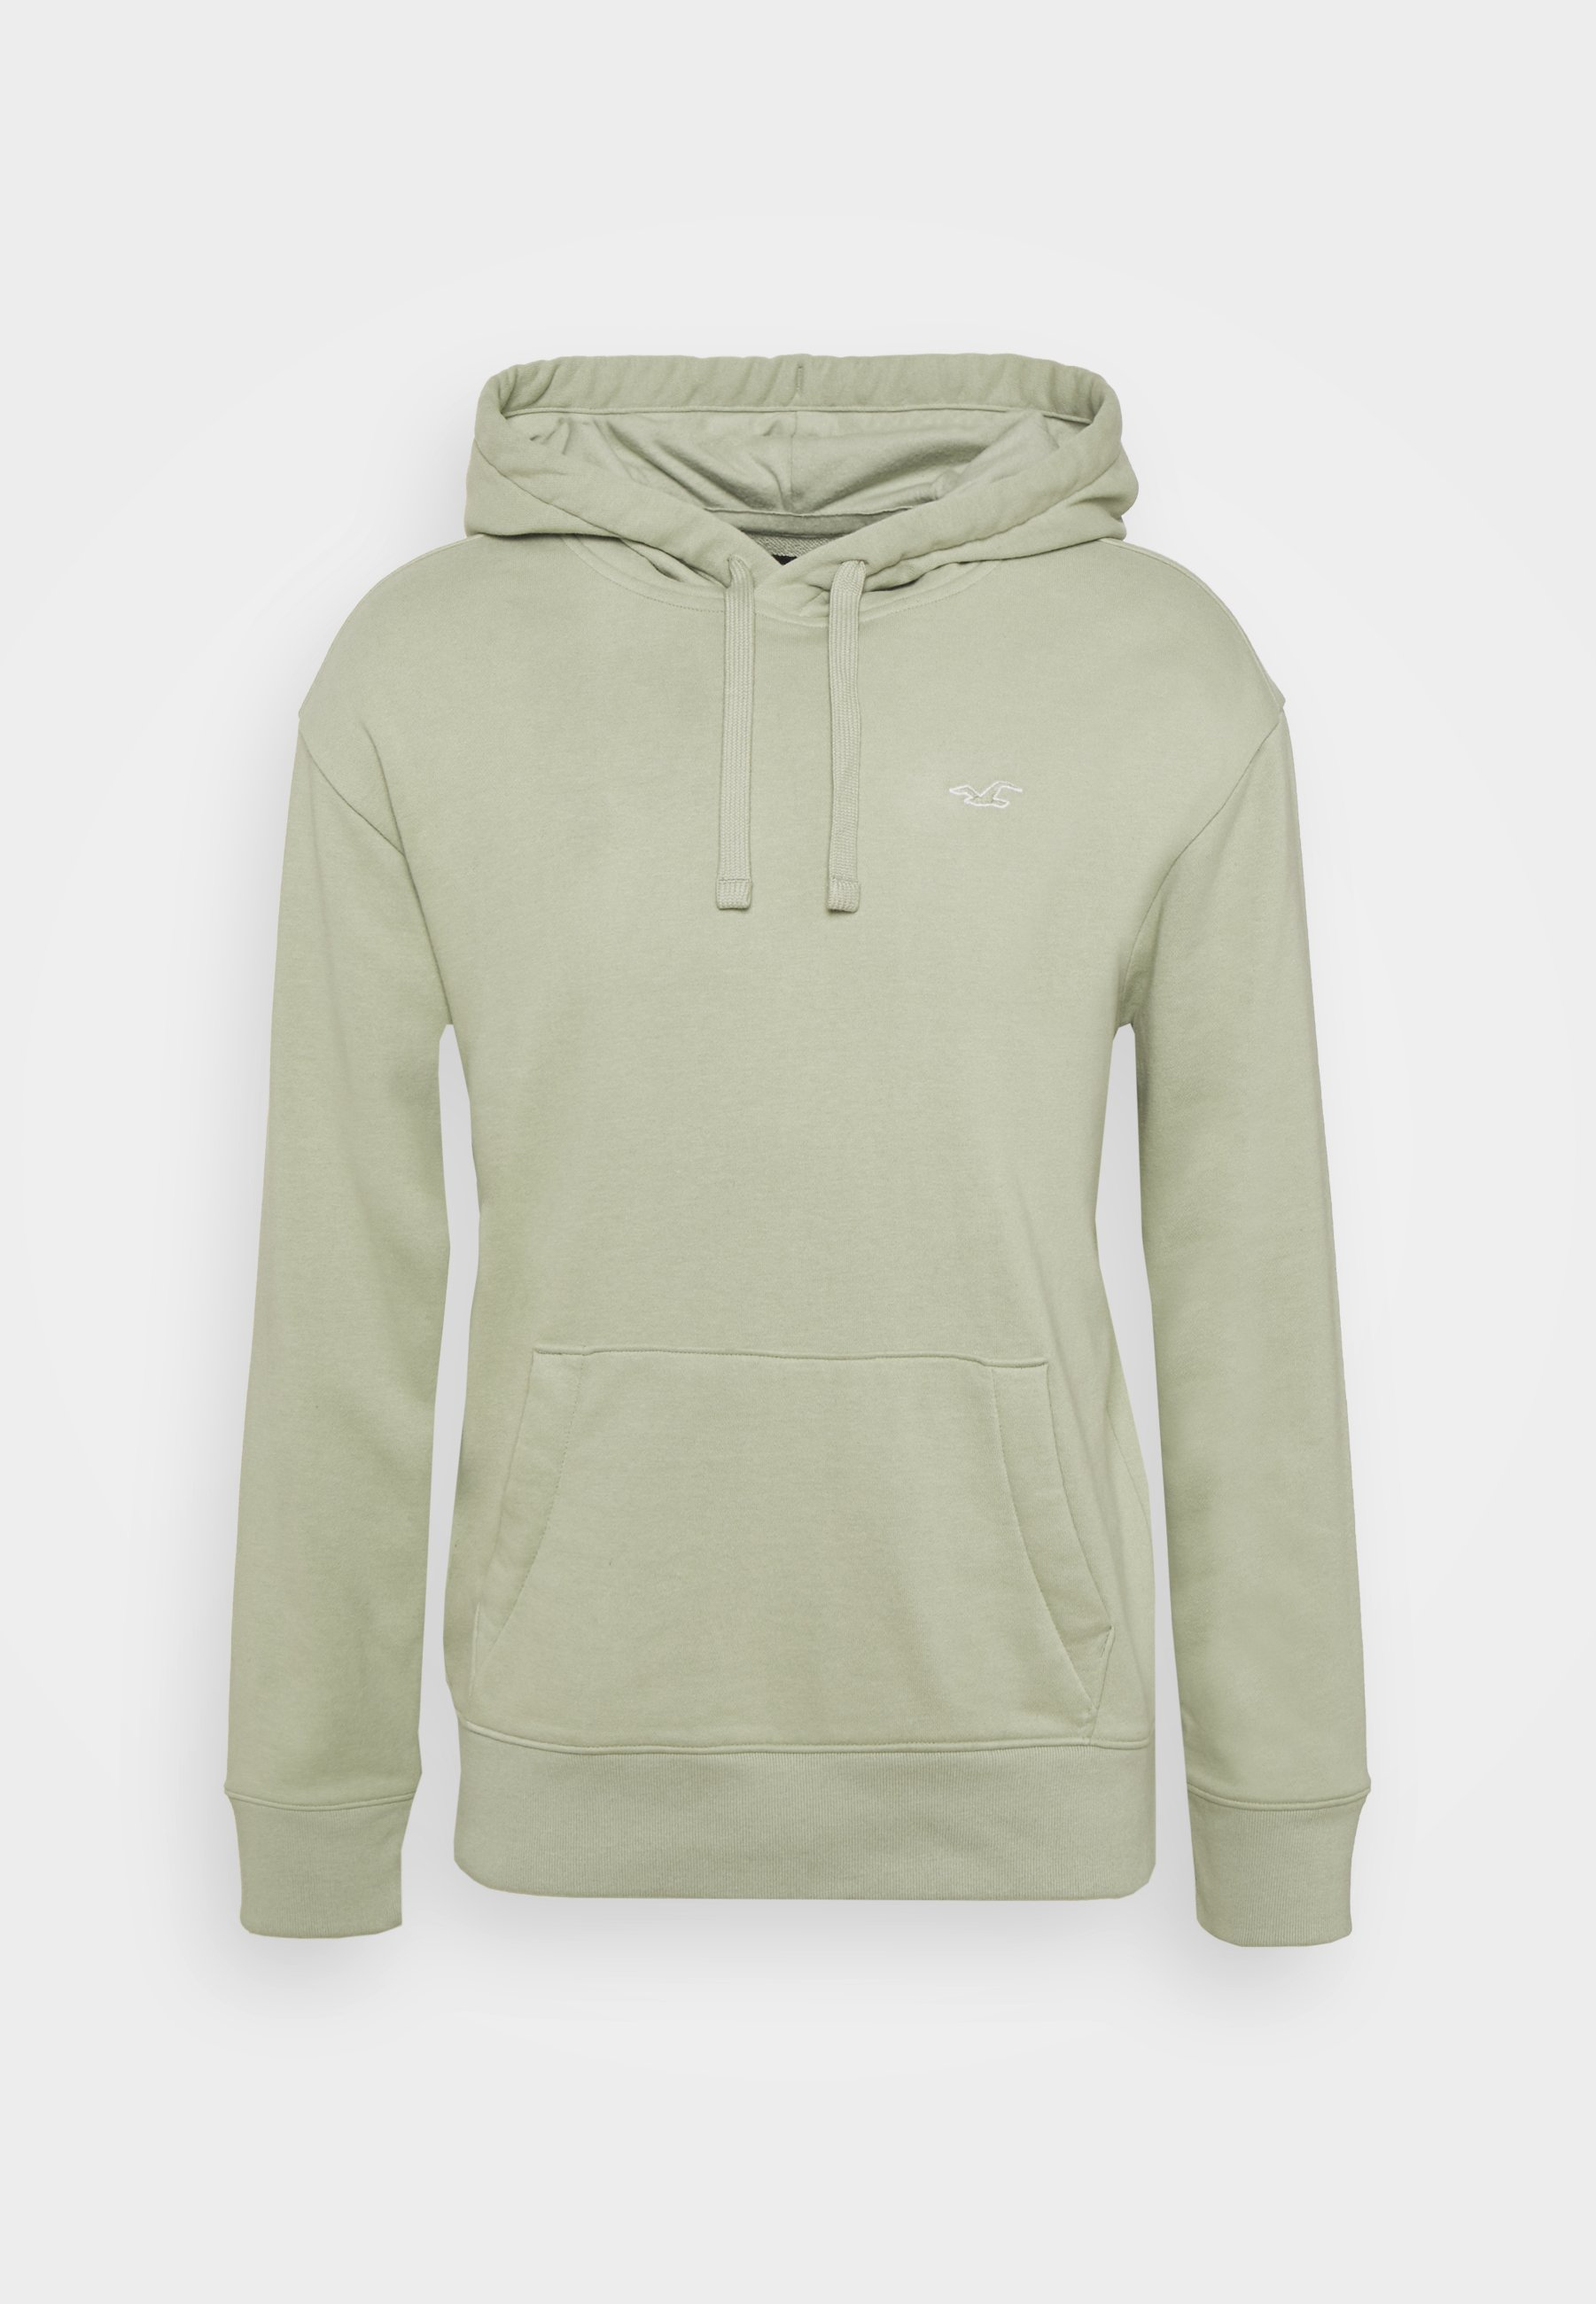 Homme ICON SOLIDS - Sweatshirt